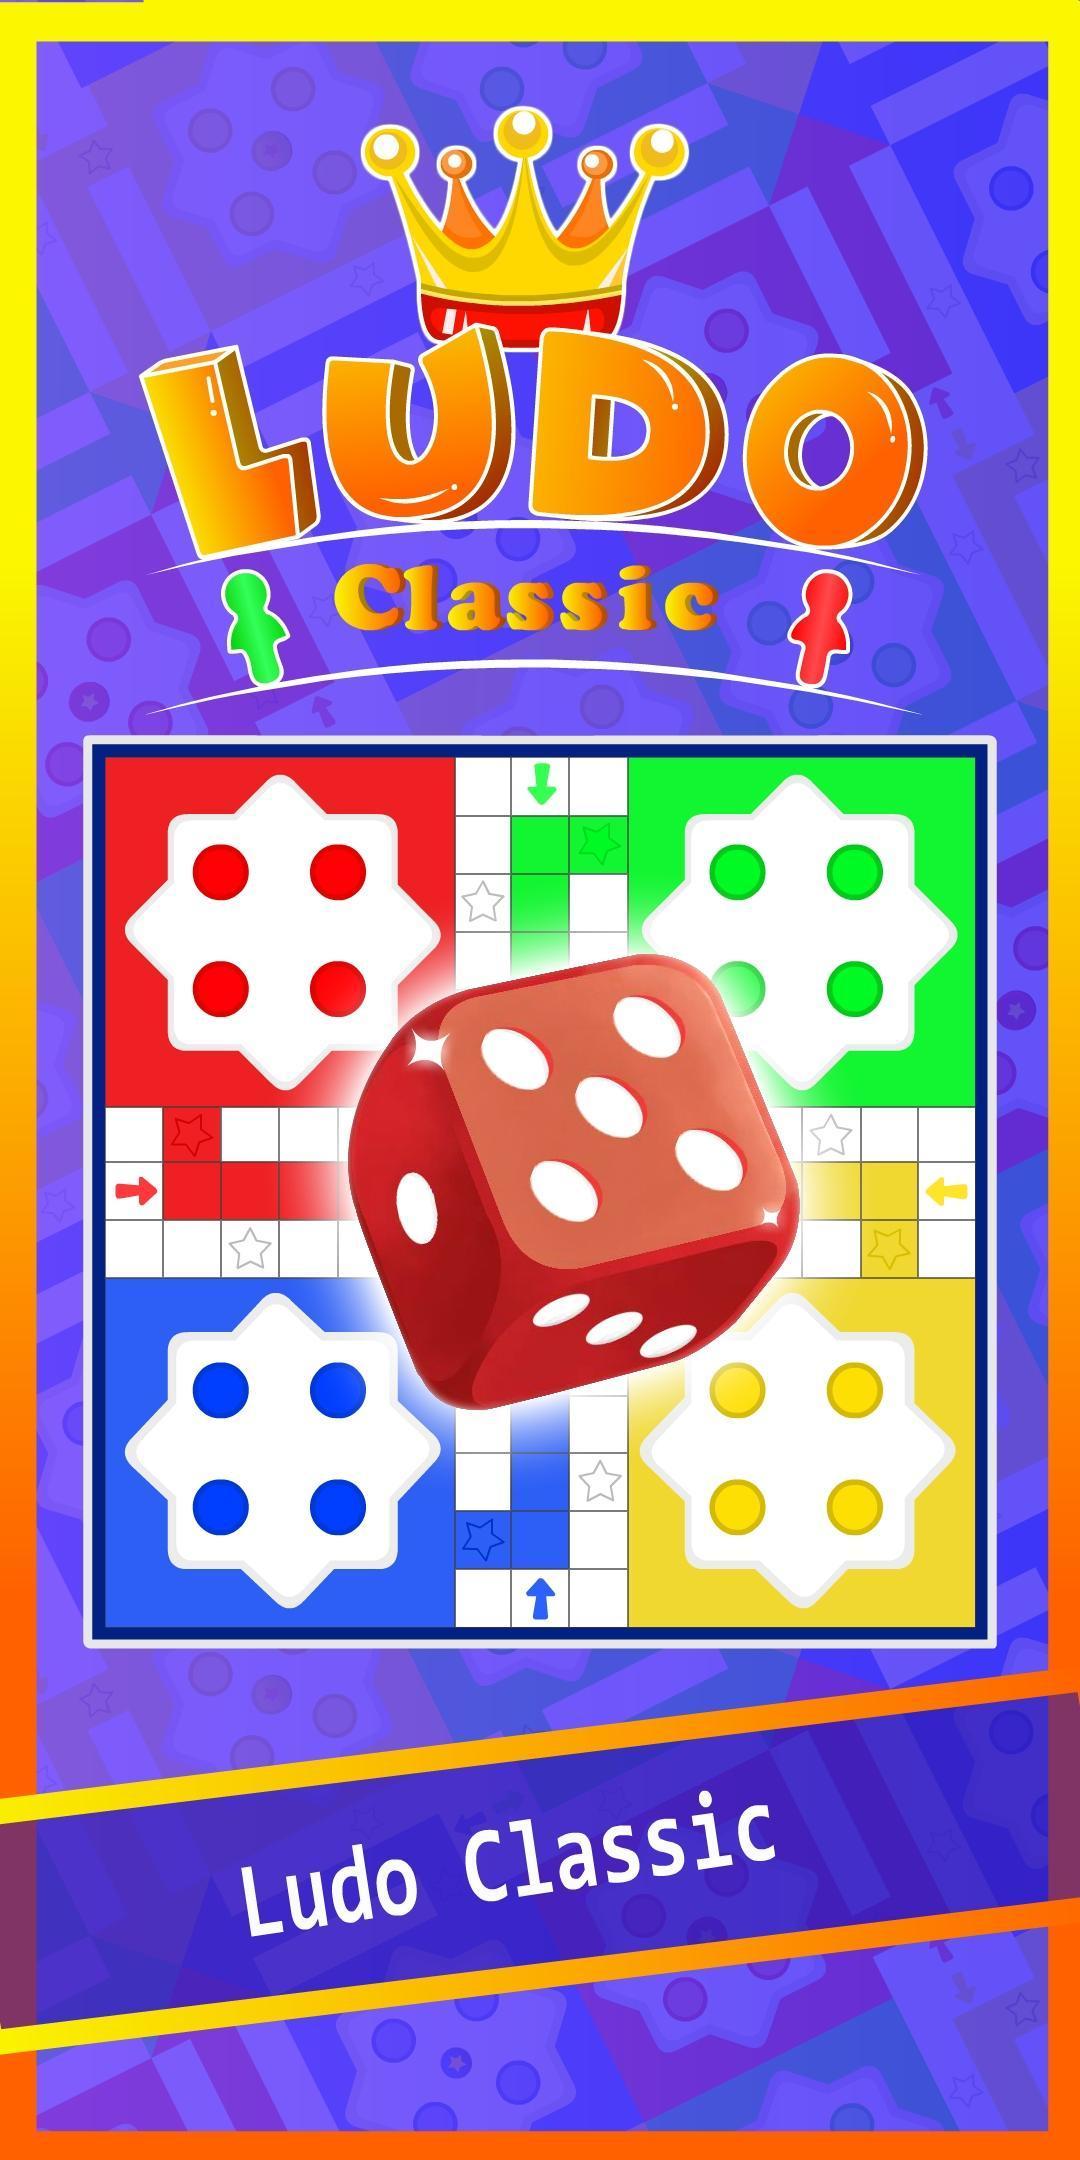 Ludo Club - Ludo Classic - King of Board Games 👑 1.5 Screenshot 1